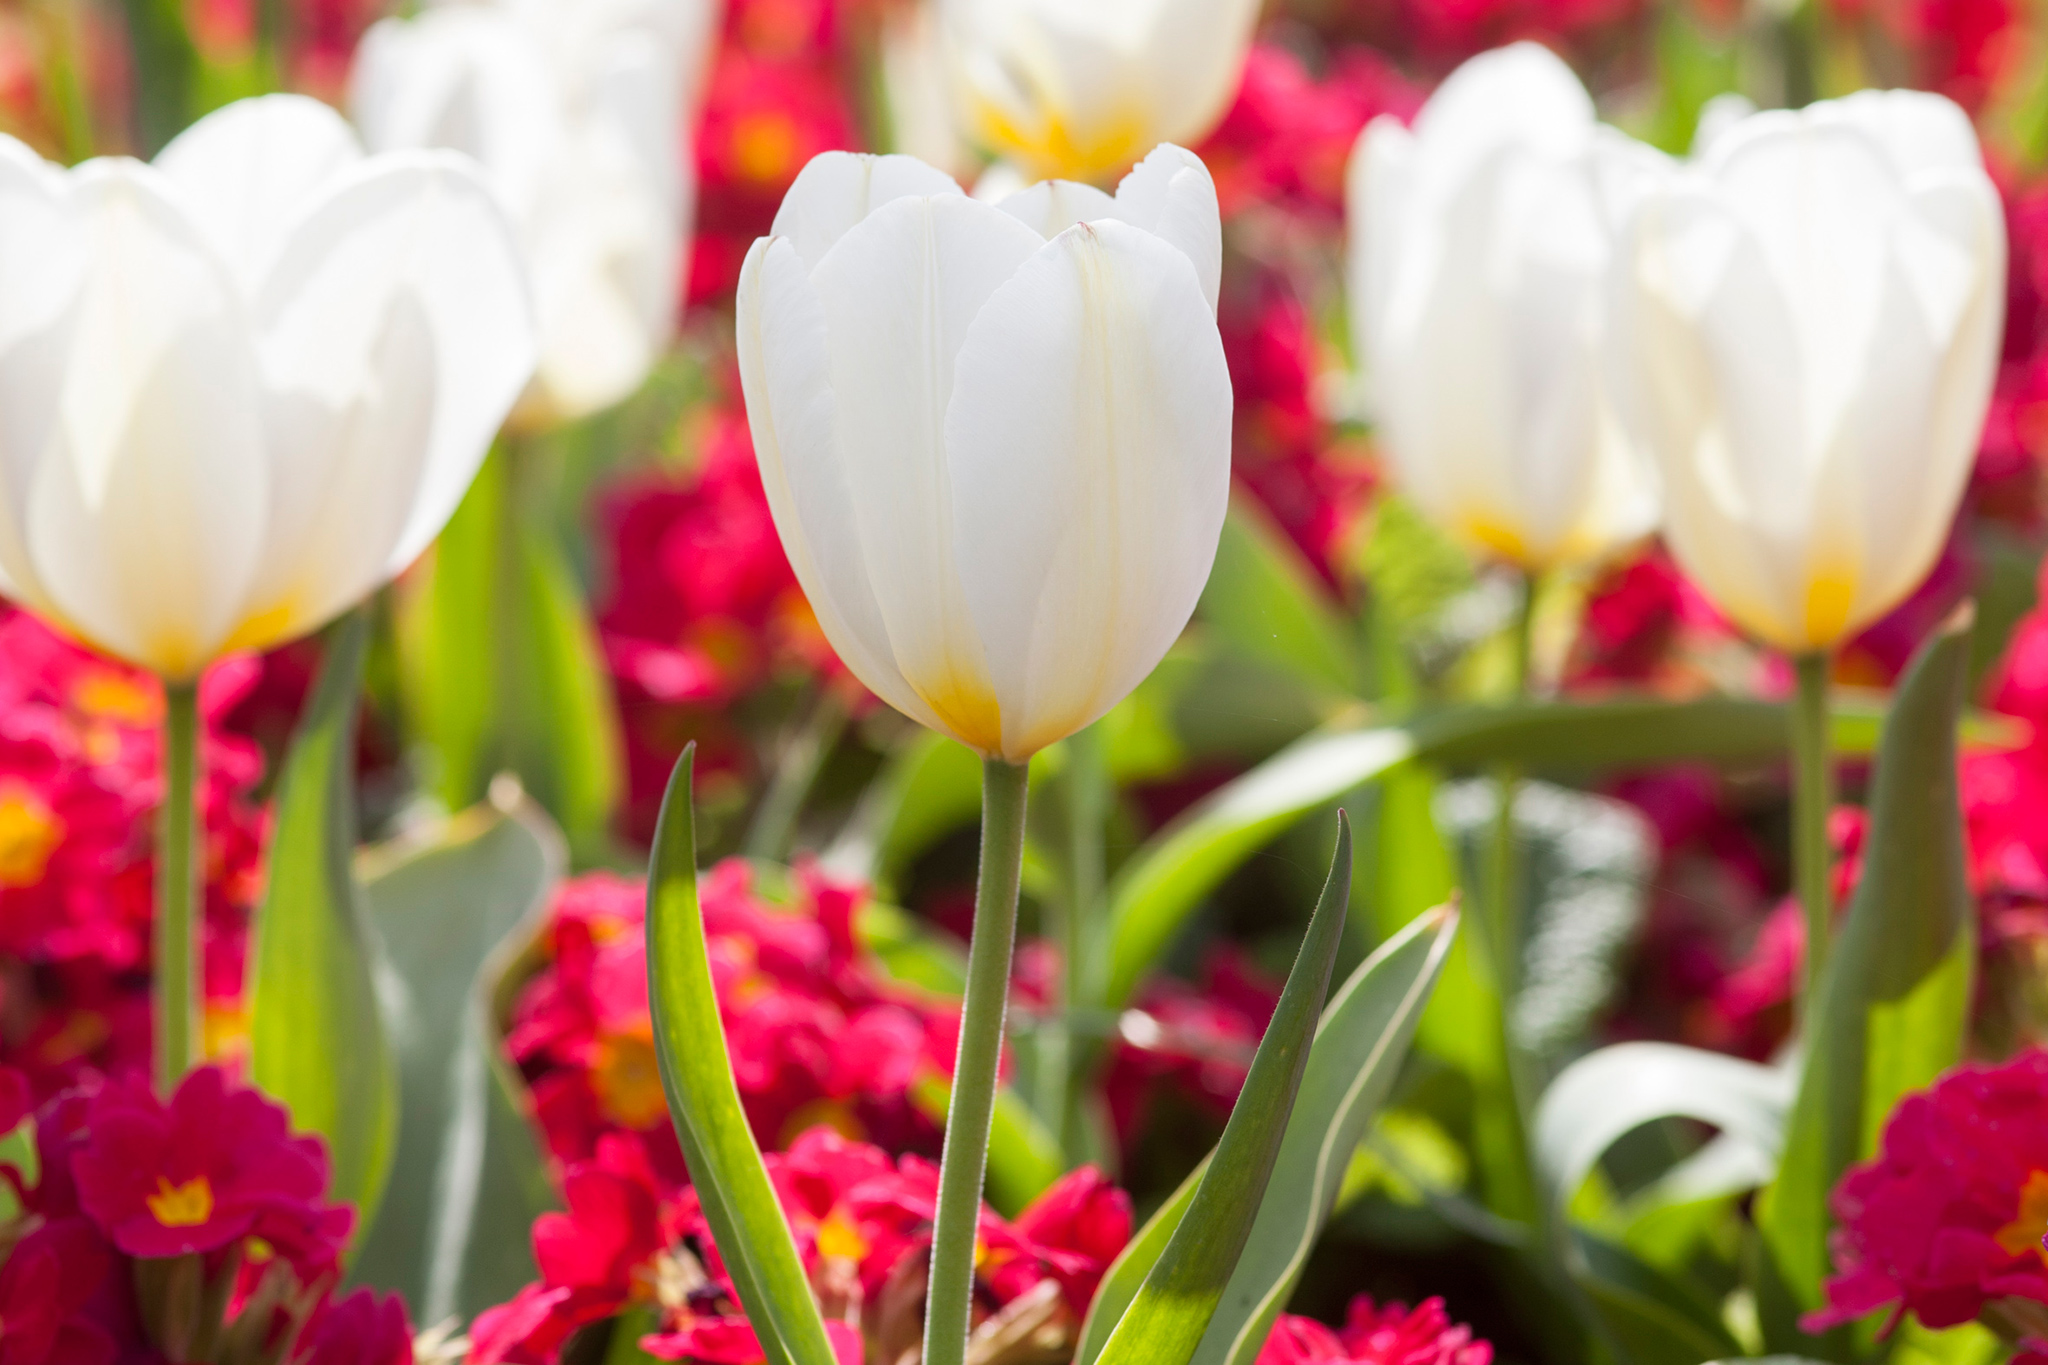 Tulipa 'Purissima' and Primula Red